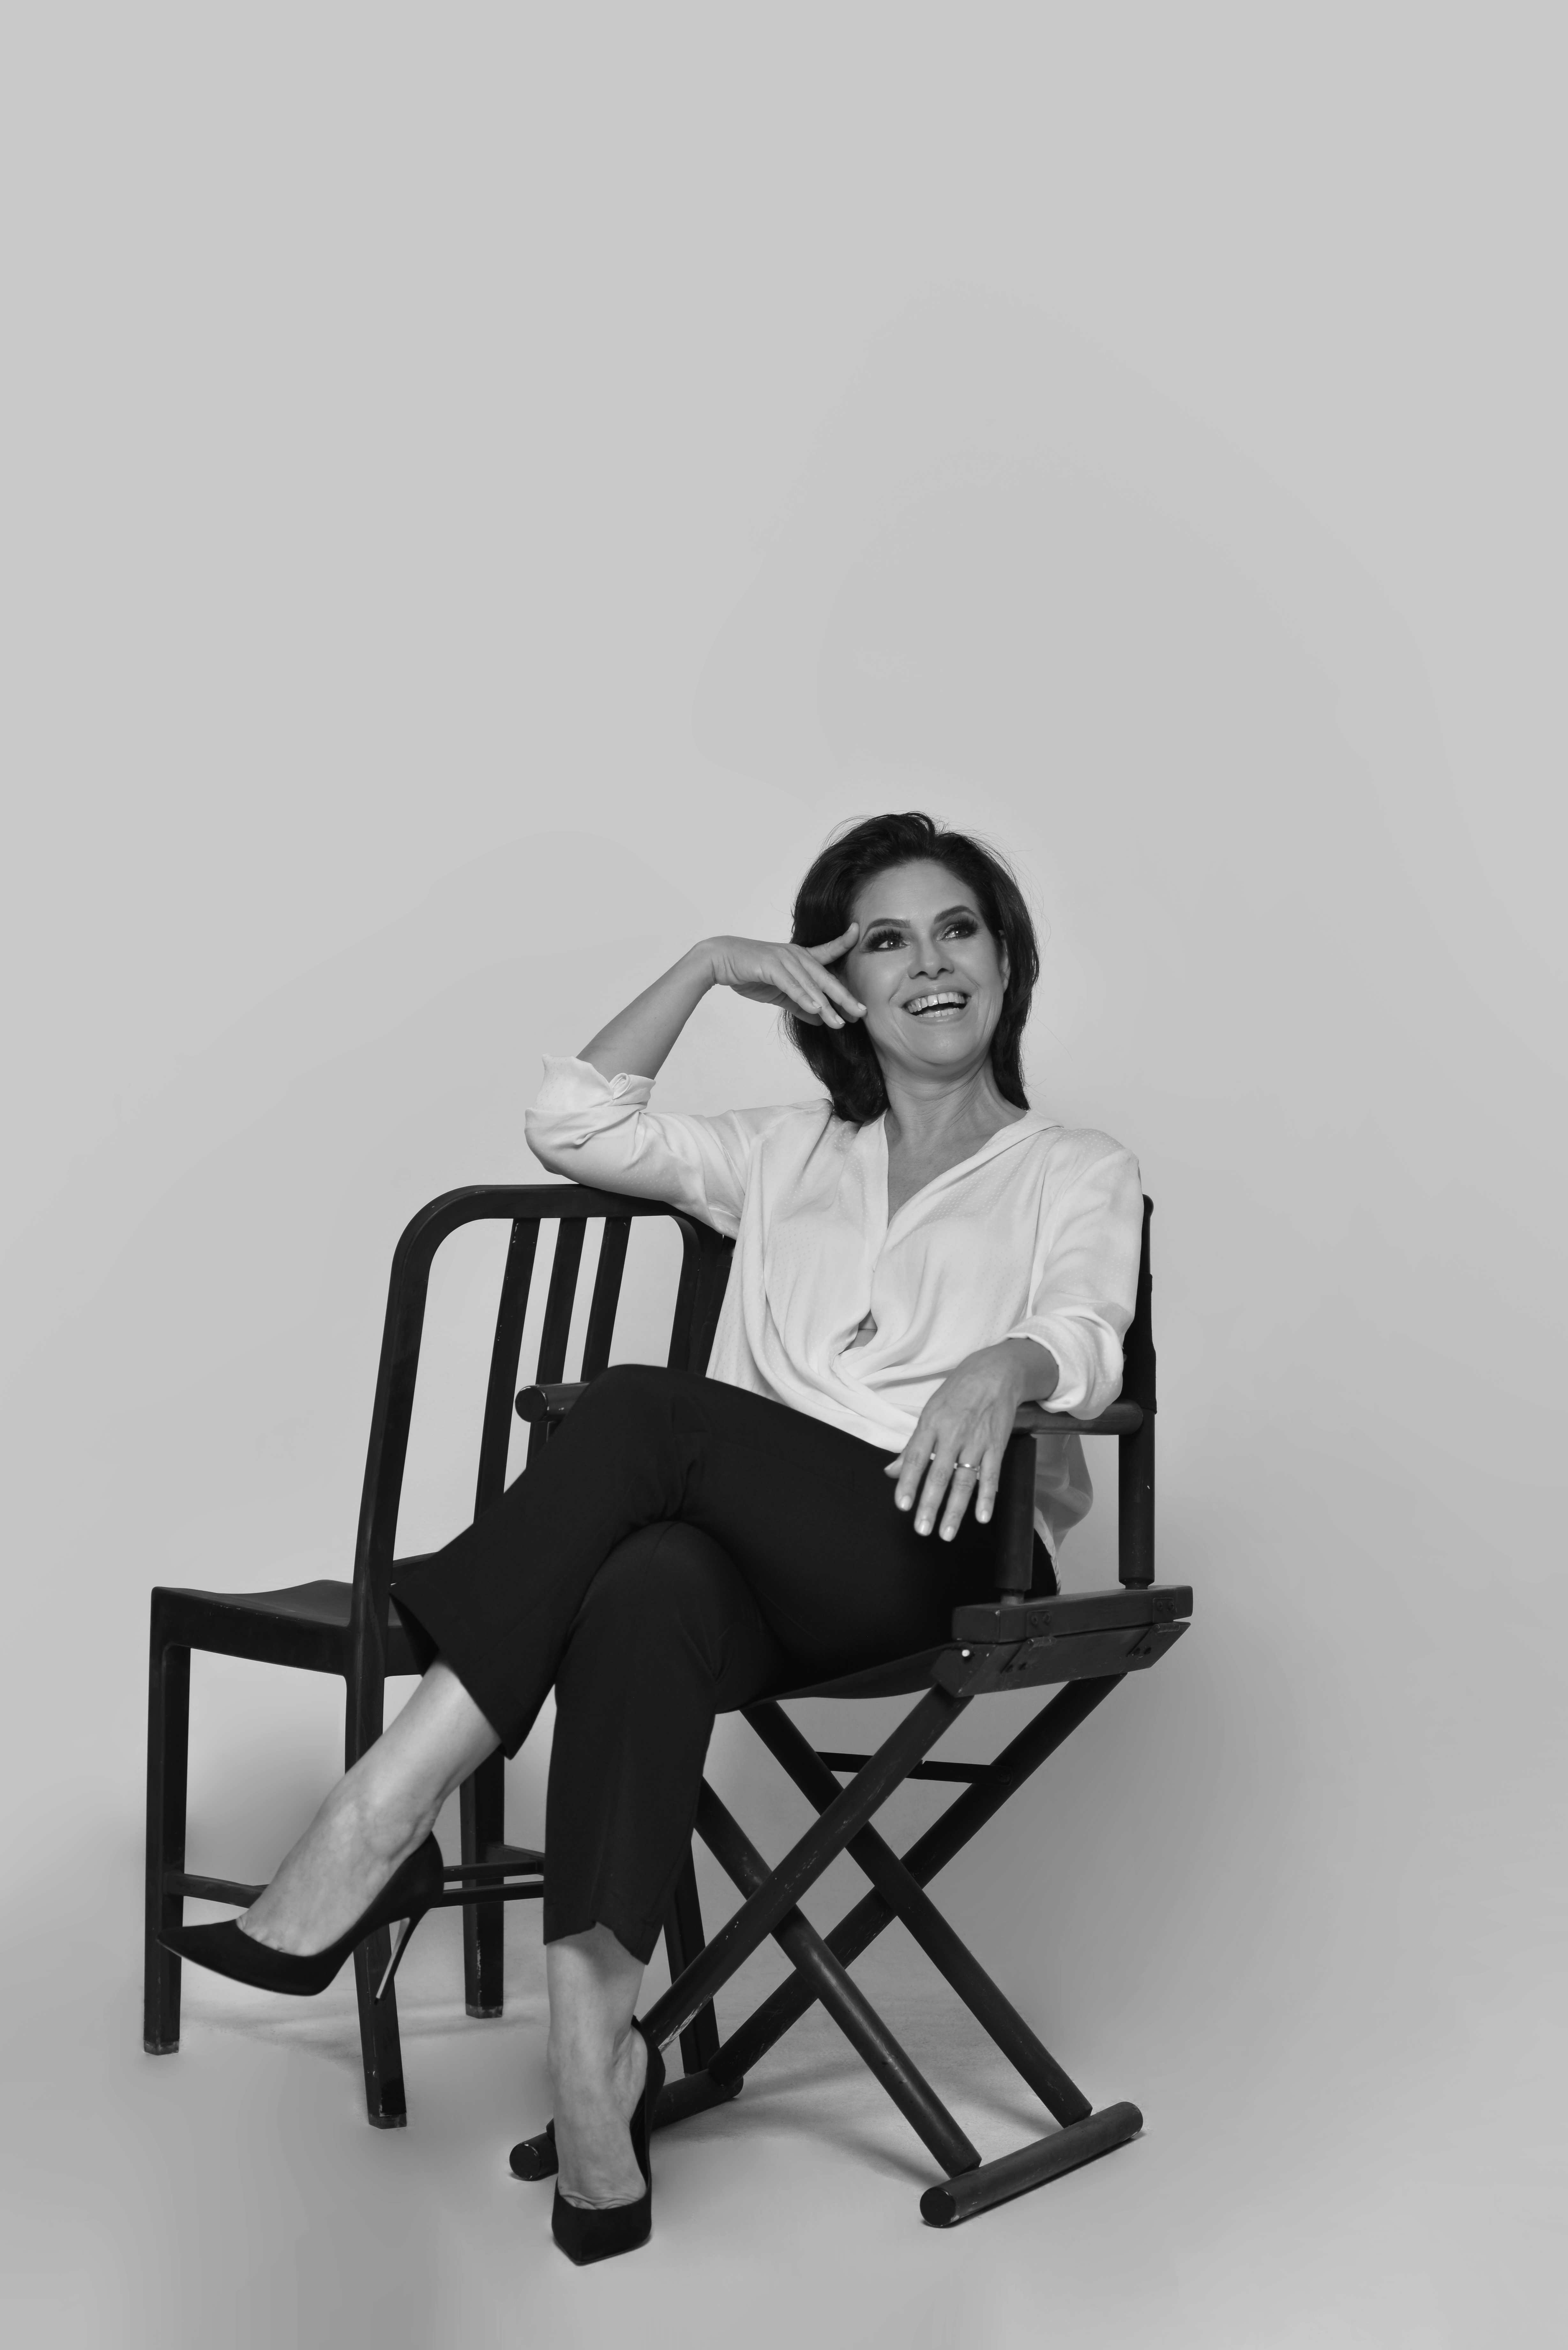 Marcia Rolon - Ricardo Valêncio